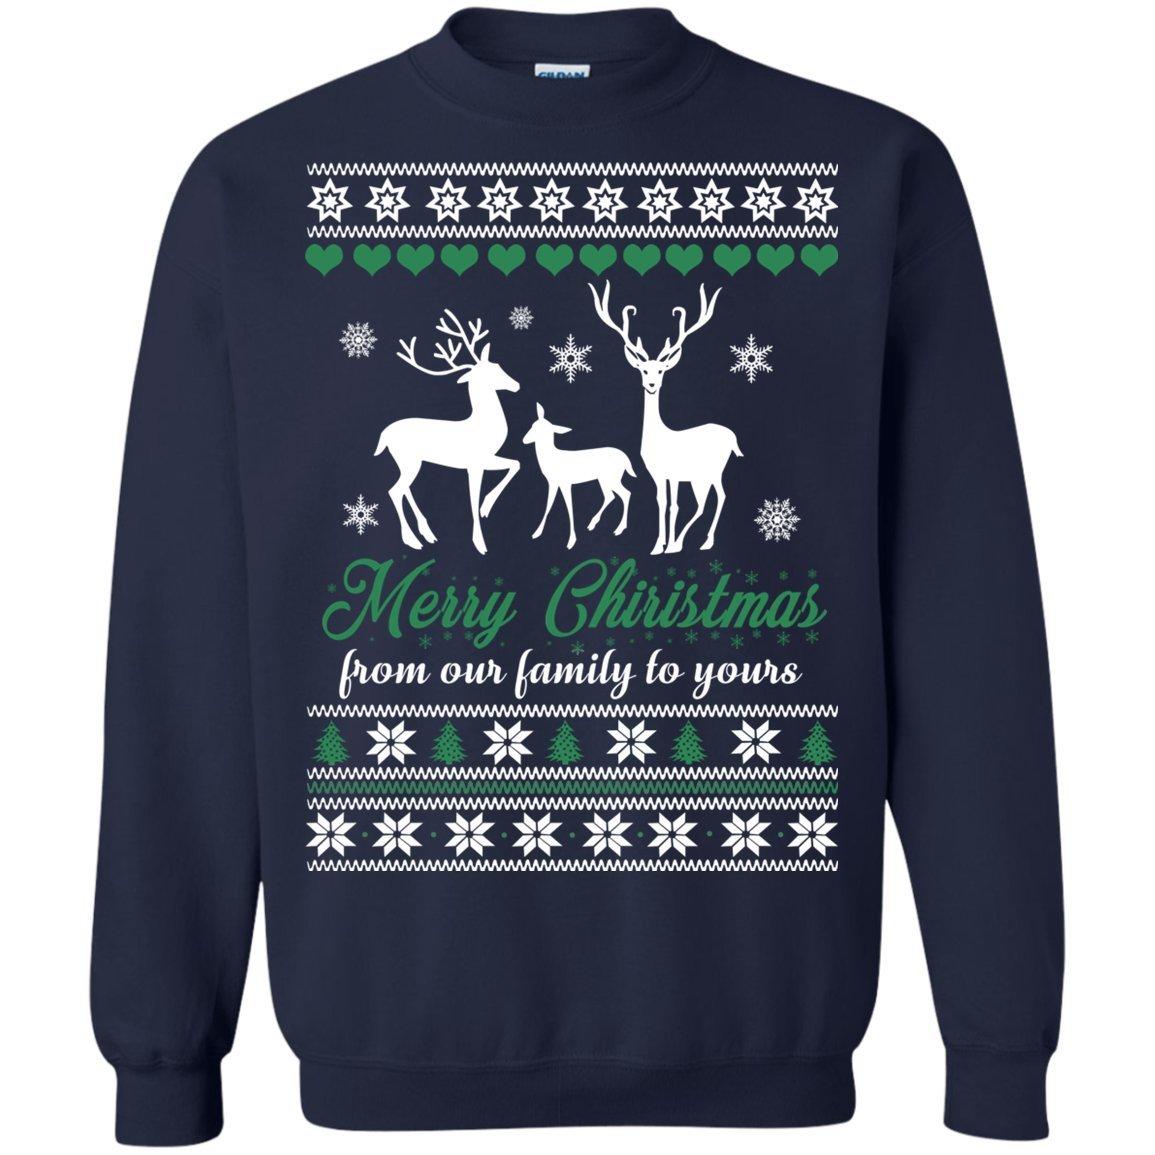 b69503112 Amazon.com: Ugly Sweatshirt Merry Christmas For Family Noel Holiday Funny Sweater  Shirt Gift: Clothing